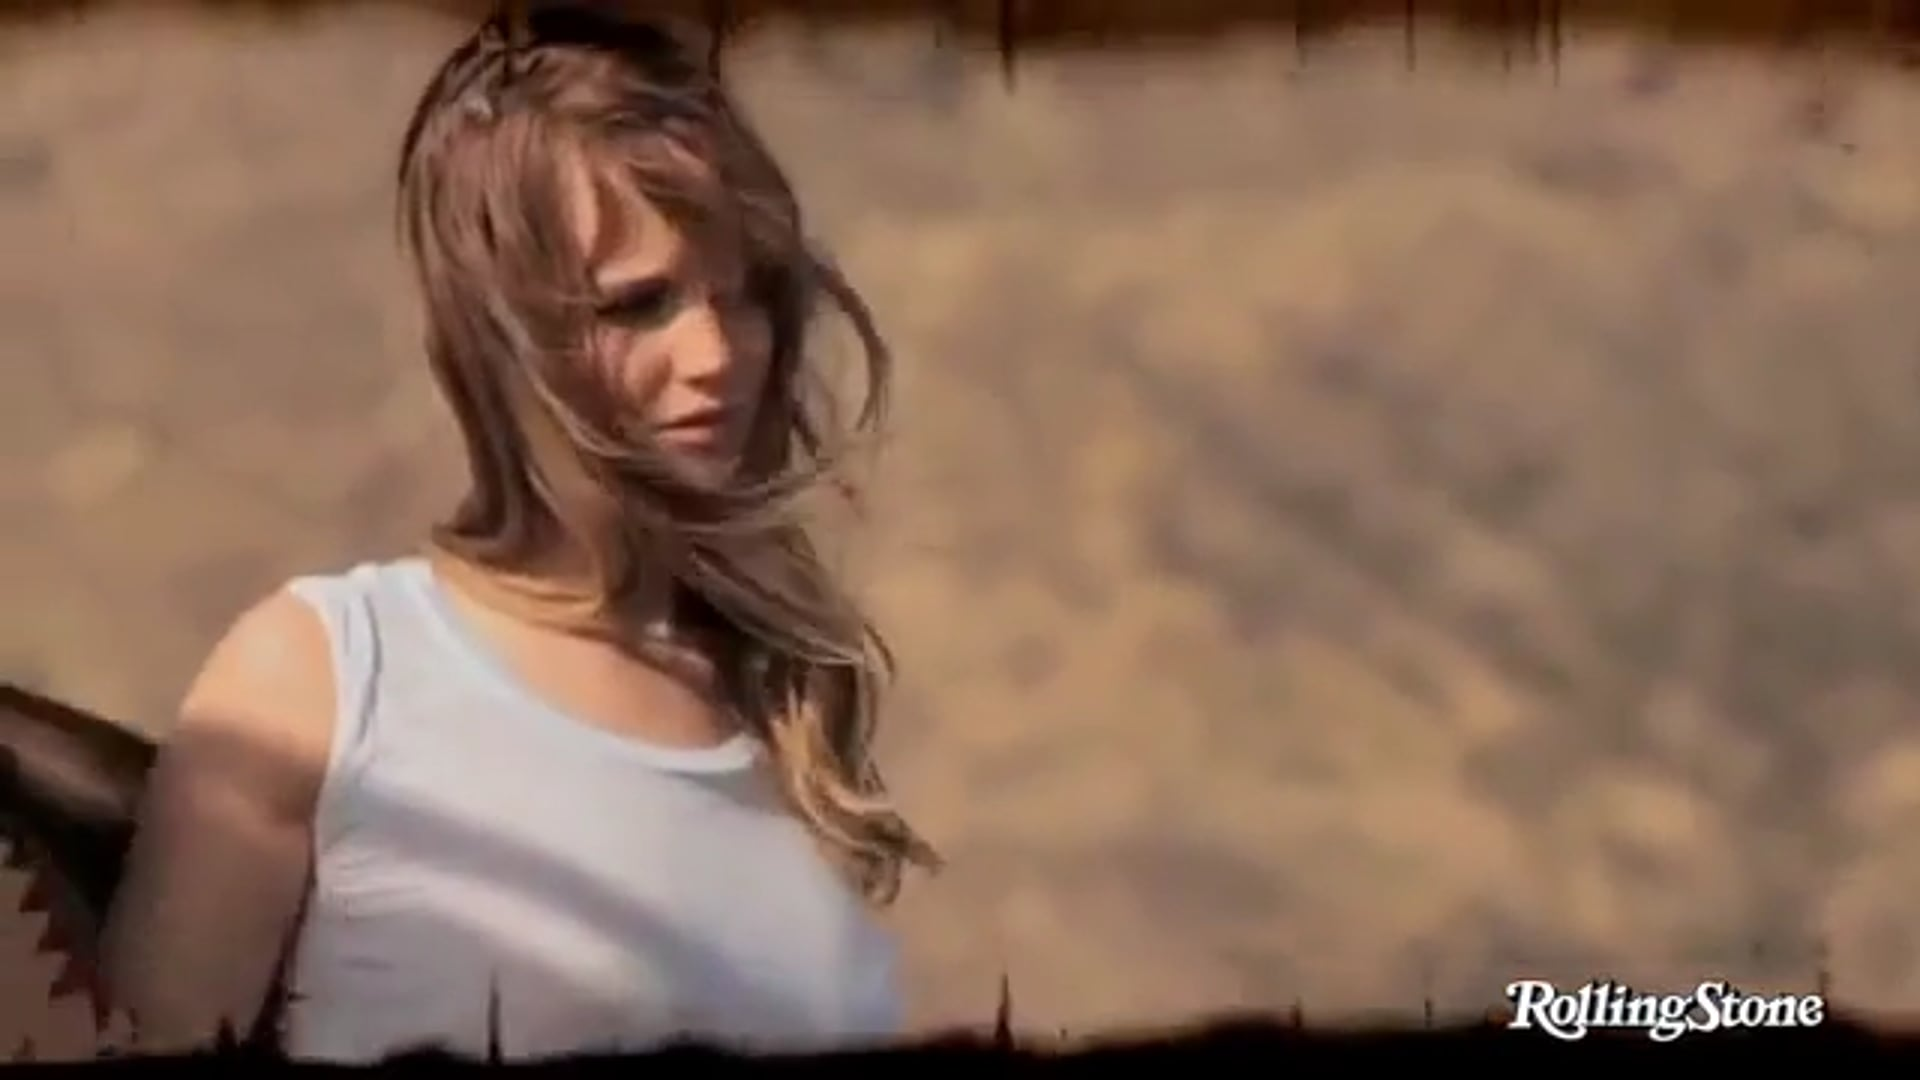 Jennifer Lawrence  'Hunger Games' Rolling Stone BTS Sizzle